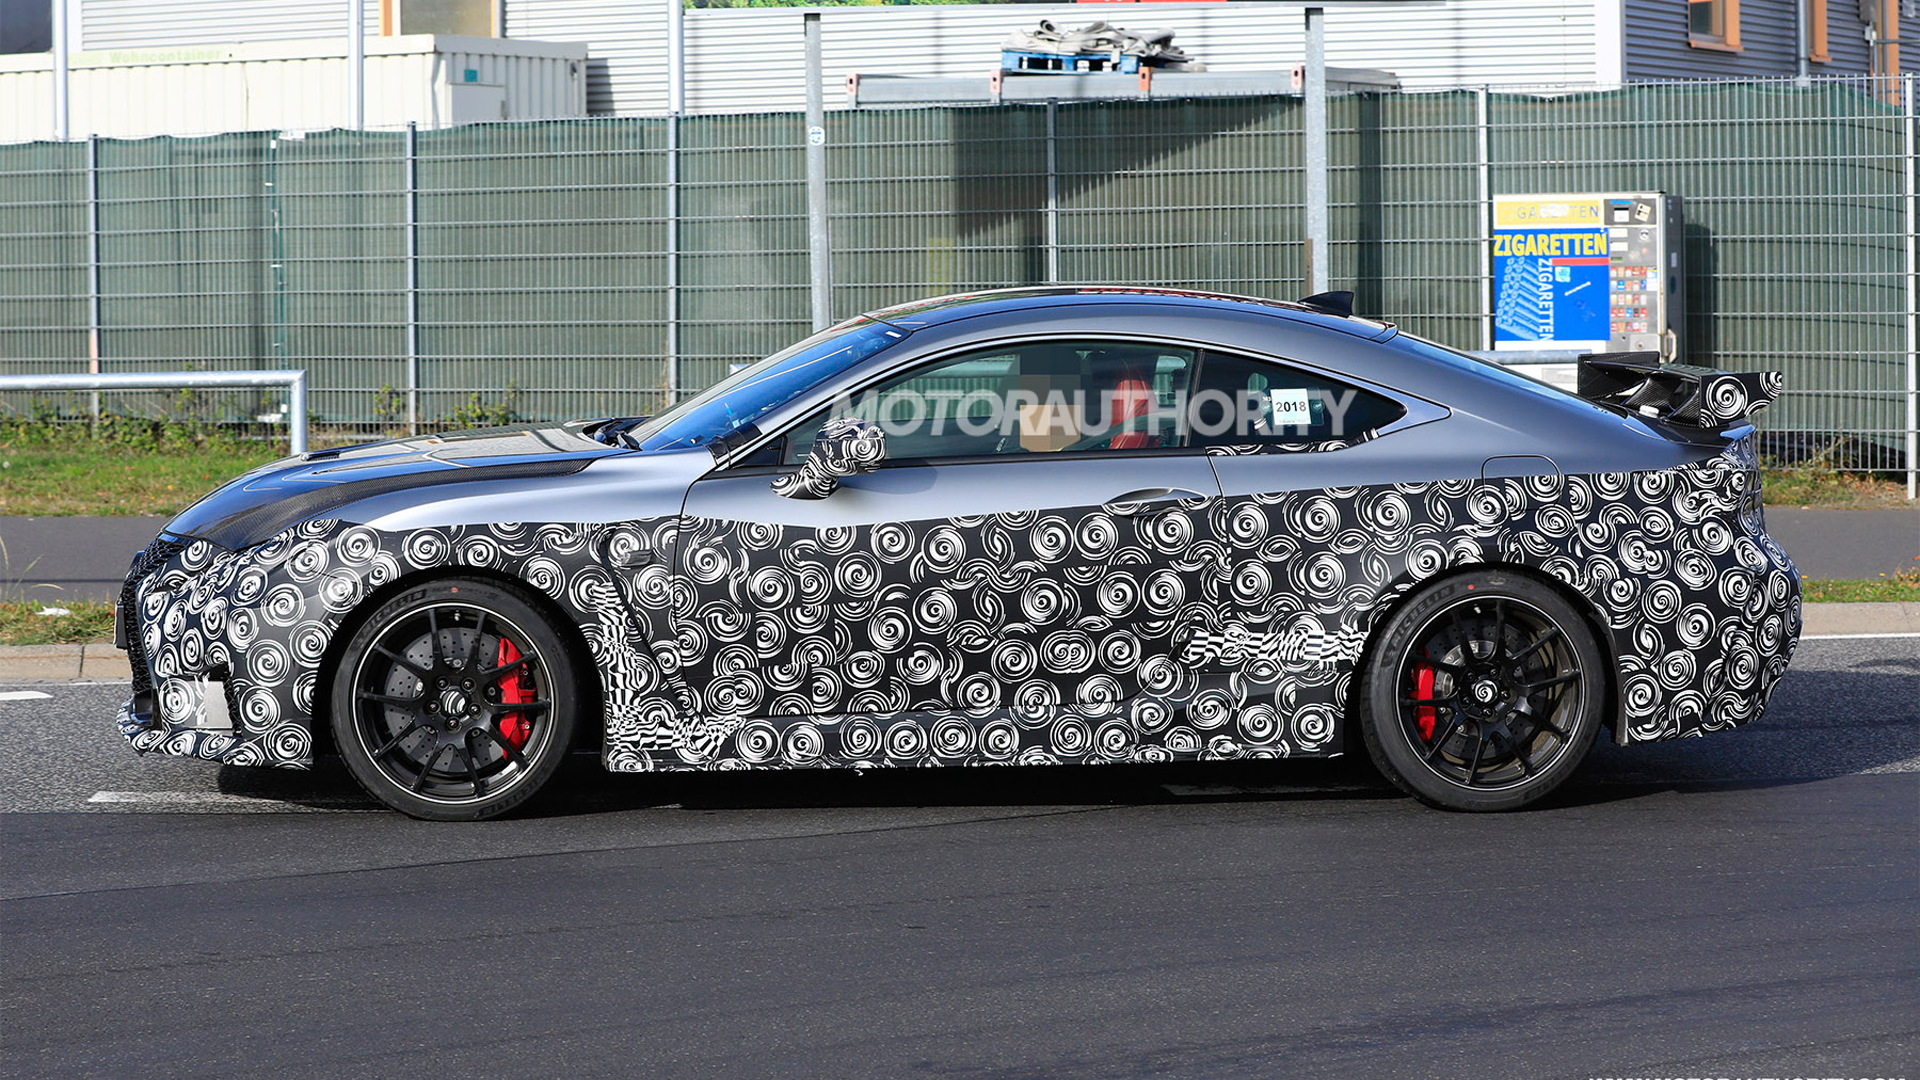 2020 Lexus RC F Track Edition spy shots - Image via S. Baldauf/SB-Medien